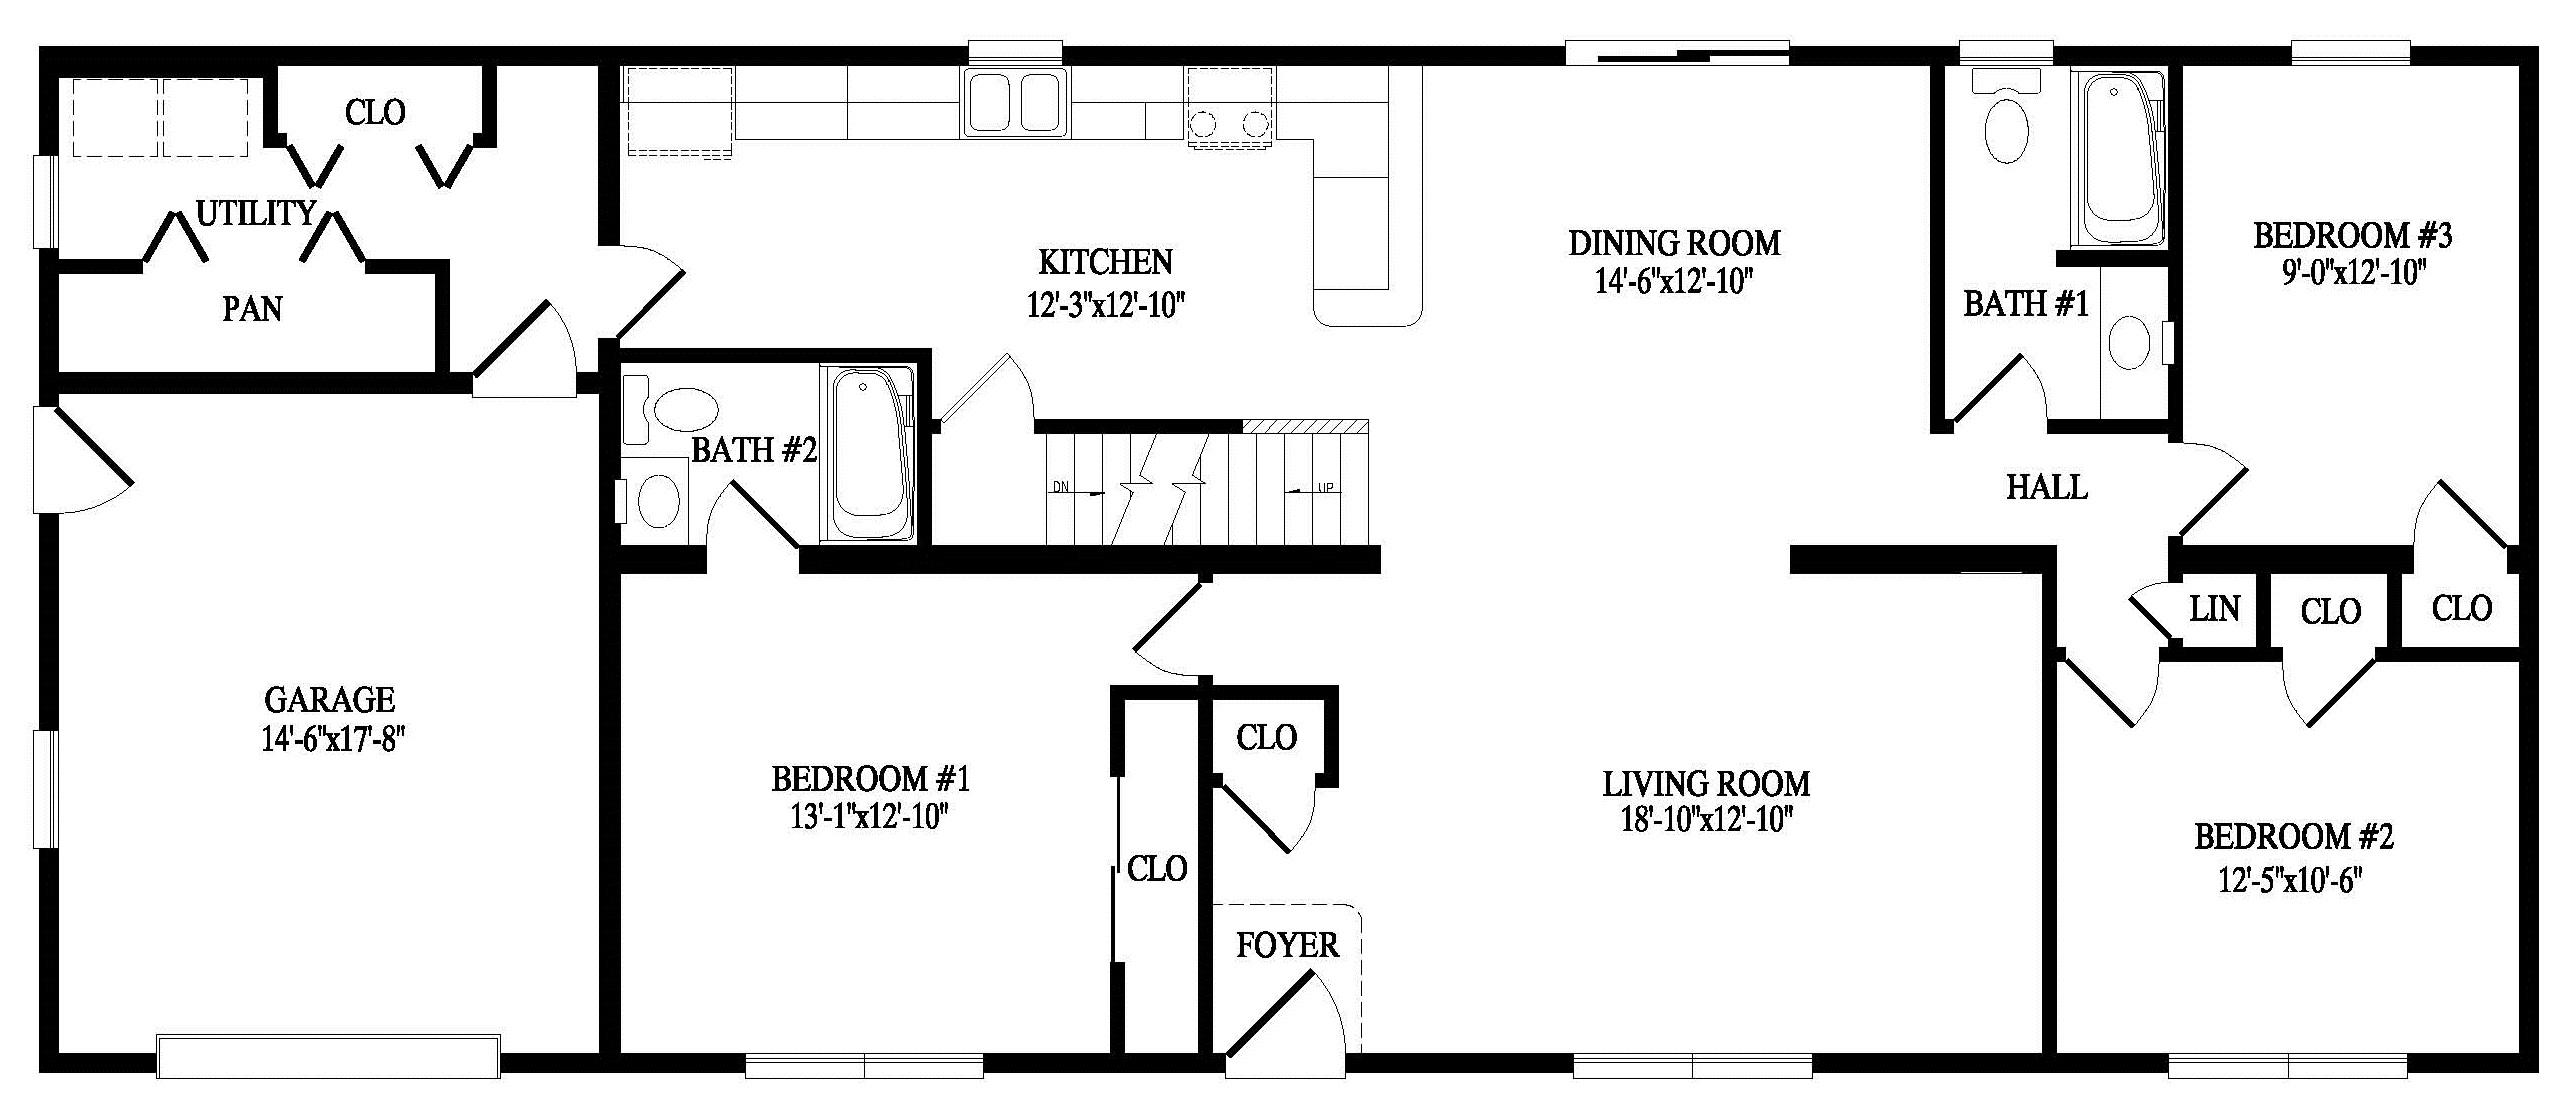 this http://custombuildingsystems.net/wp-content/uploads/2017/12/ONTARIO-Residential-1st-floor.jpg